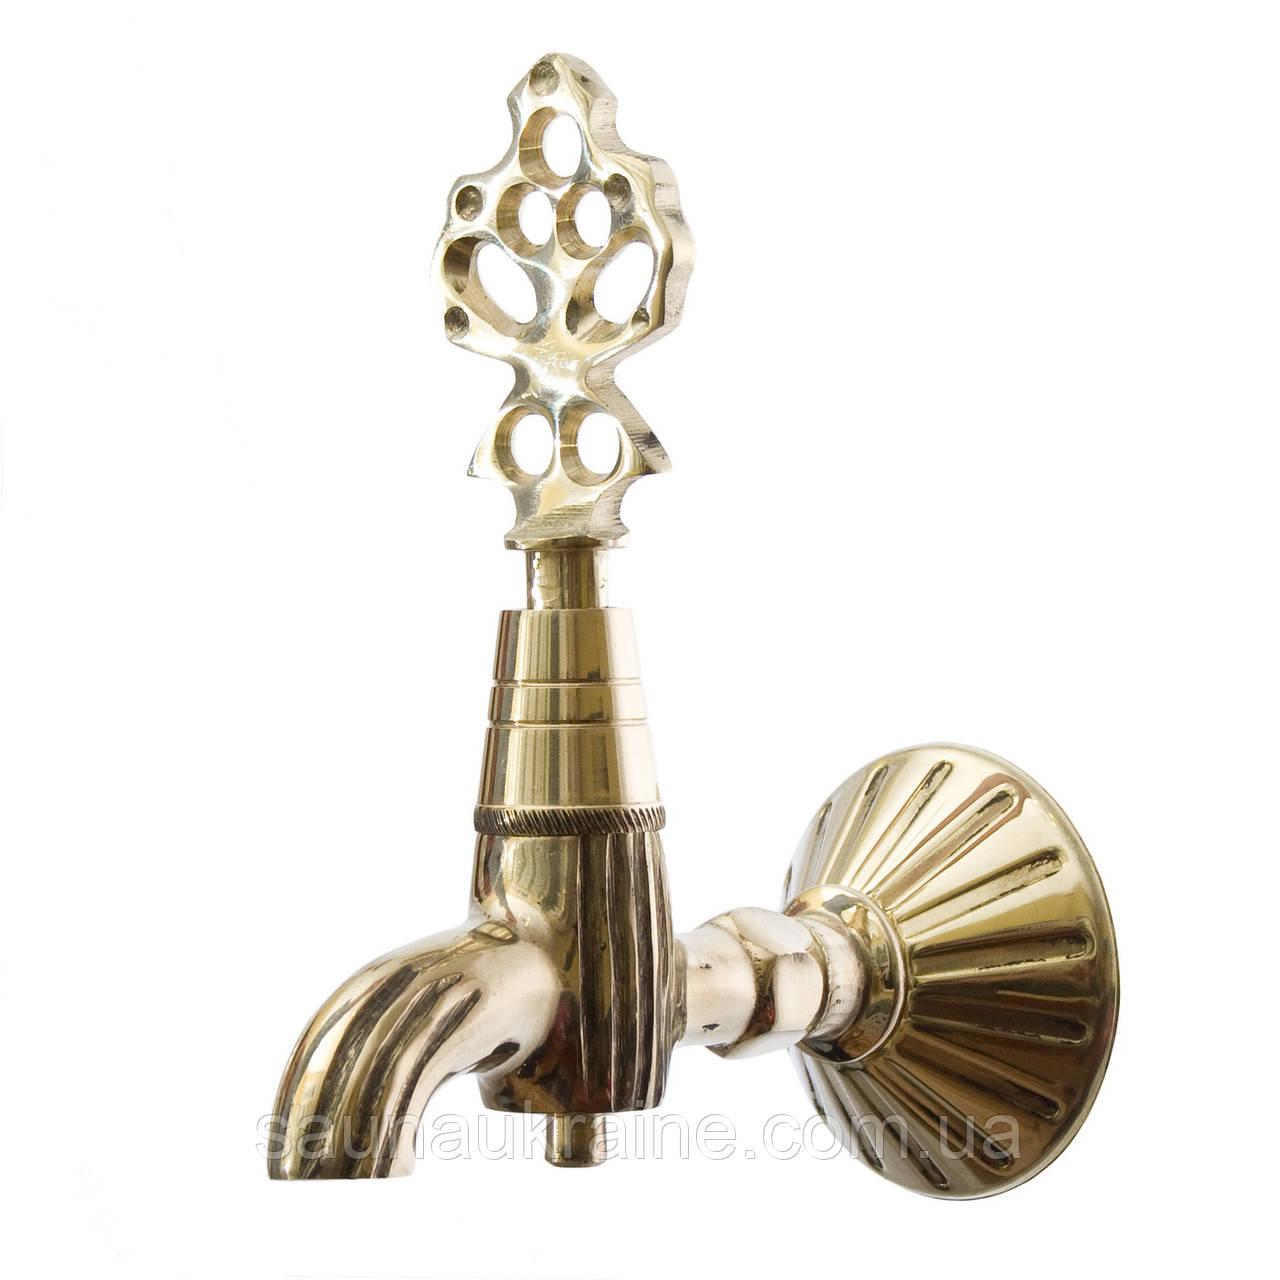 Кран Sonder 001  Золото для хамама  - турецкой бани